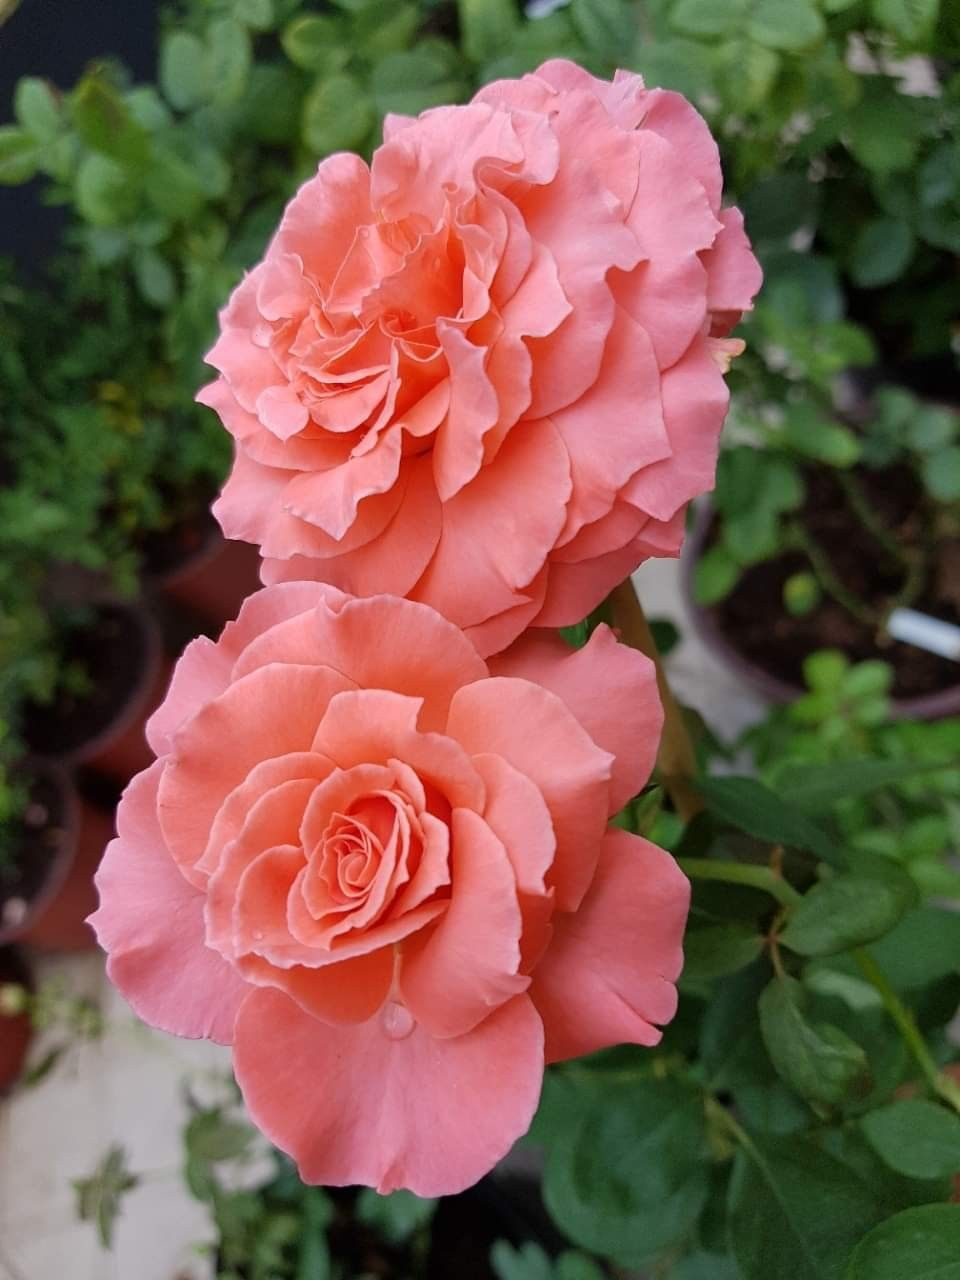 Pin By Kmlg On Flower In 2020 Beautiful Rose Flowers Hybrid Tea Roses Pretty Flowers